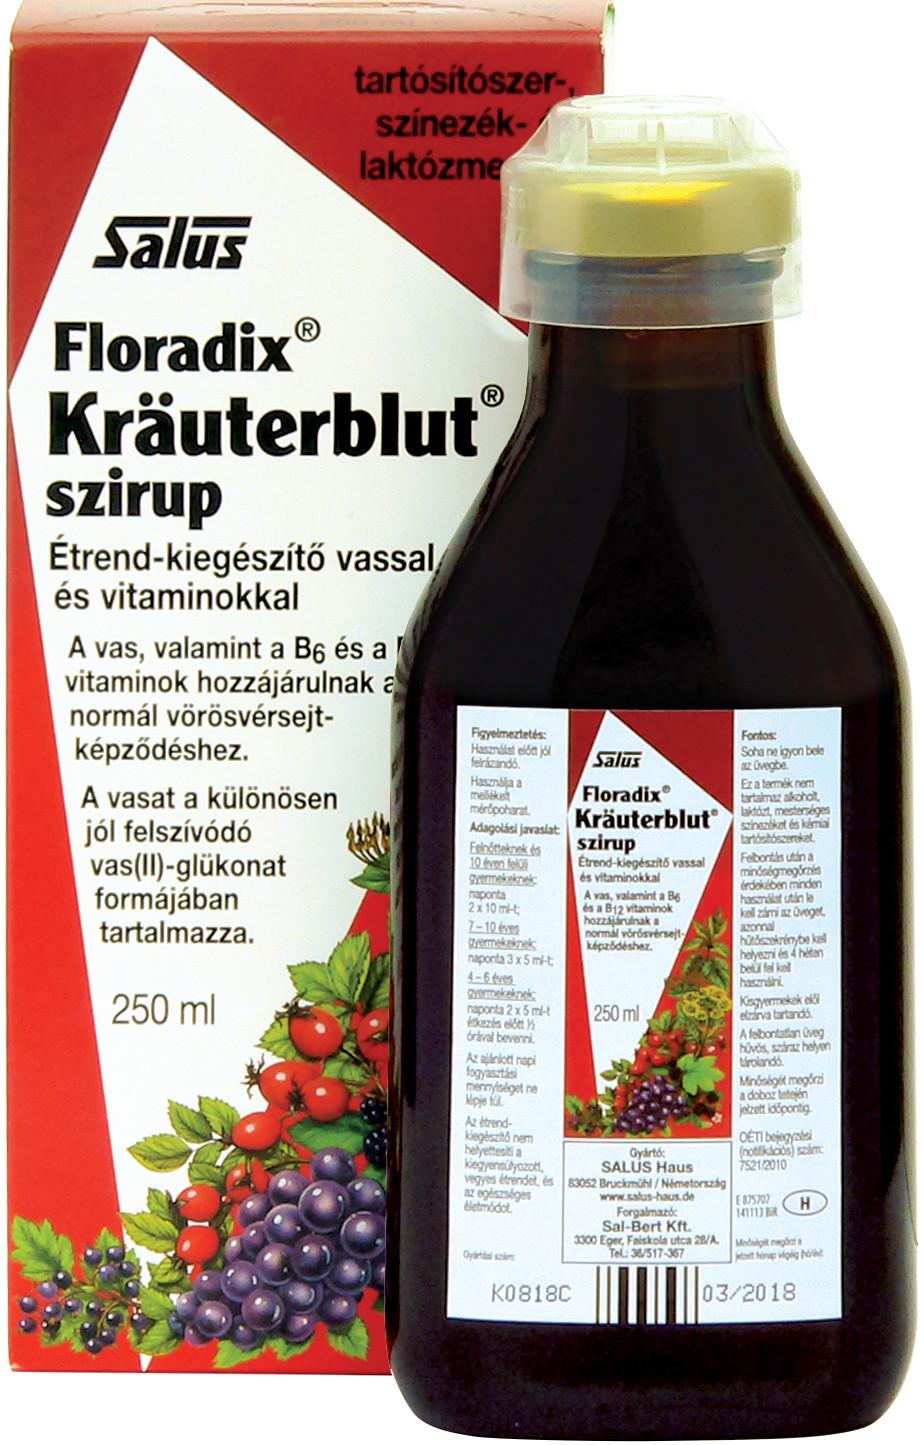 Floradix KRÄUTERBLUT szirup